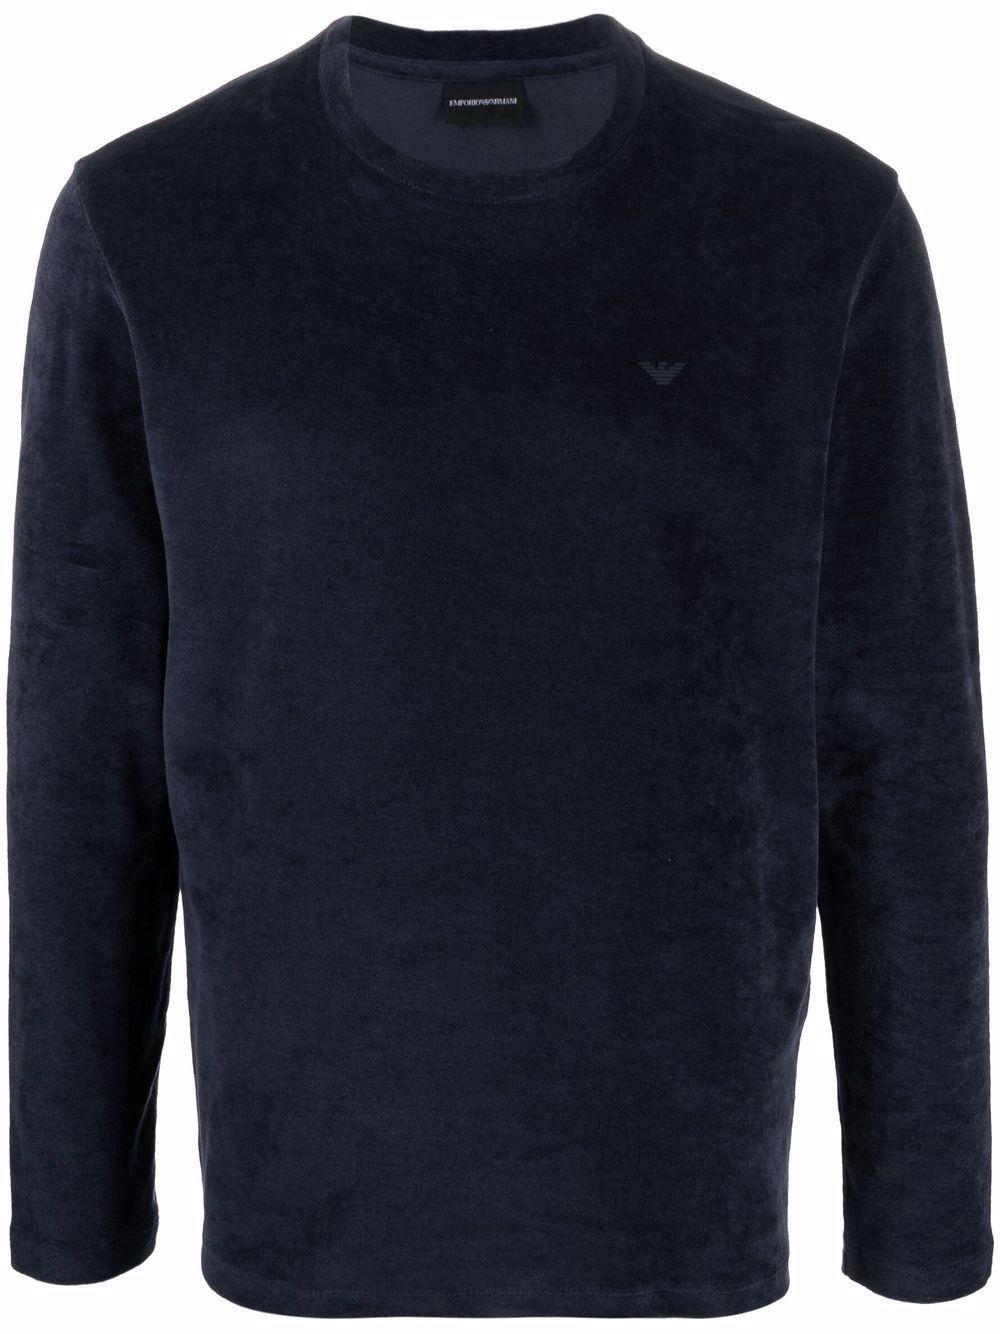 T-shirt a manica lunga in cotone